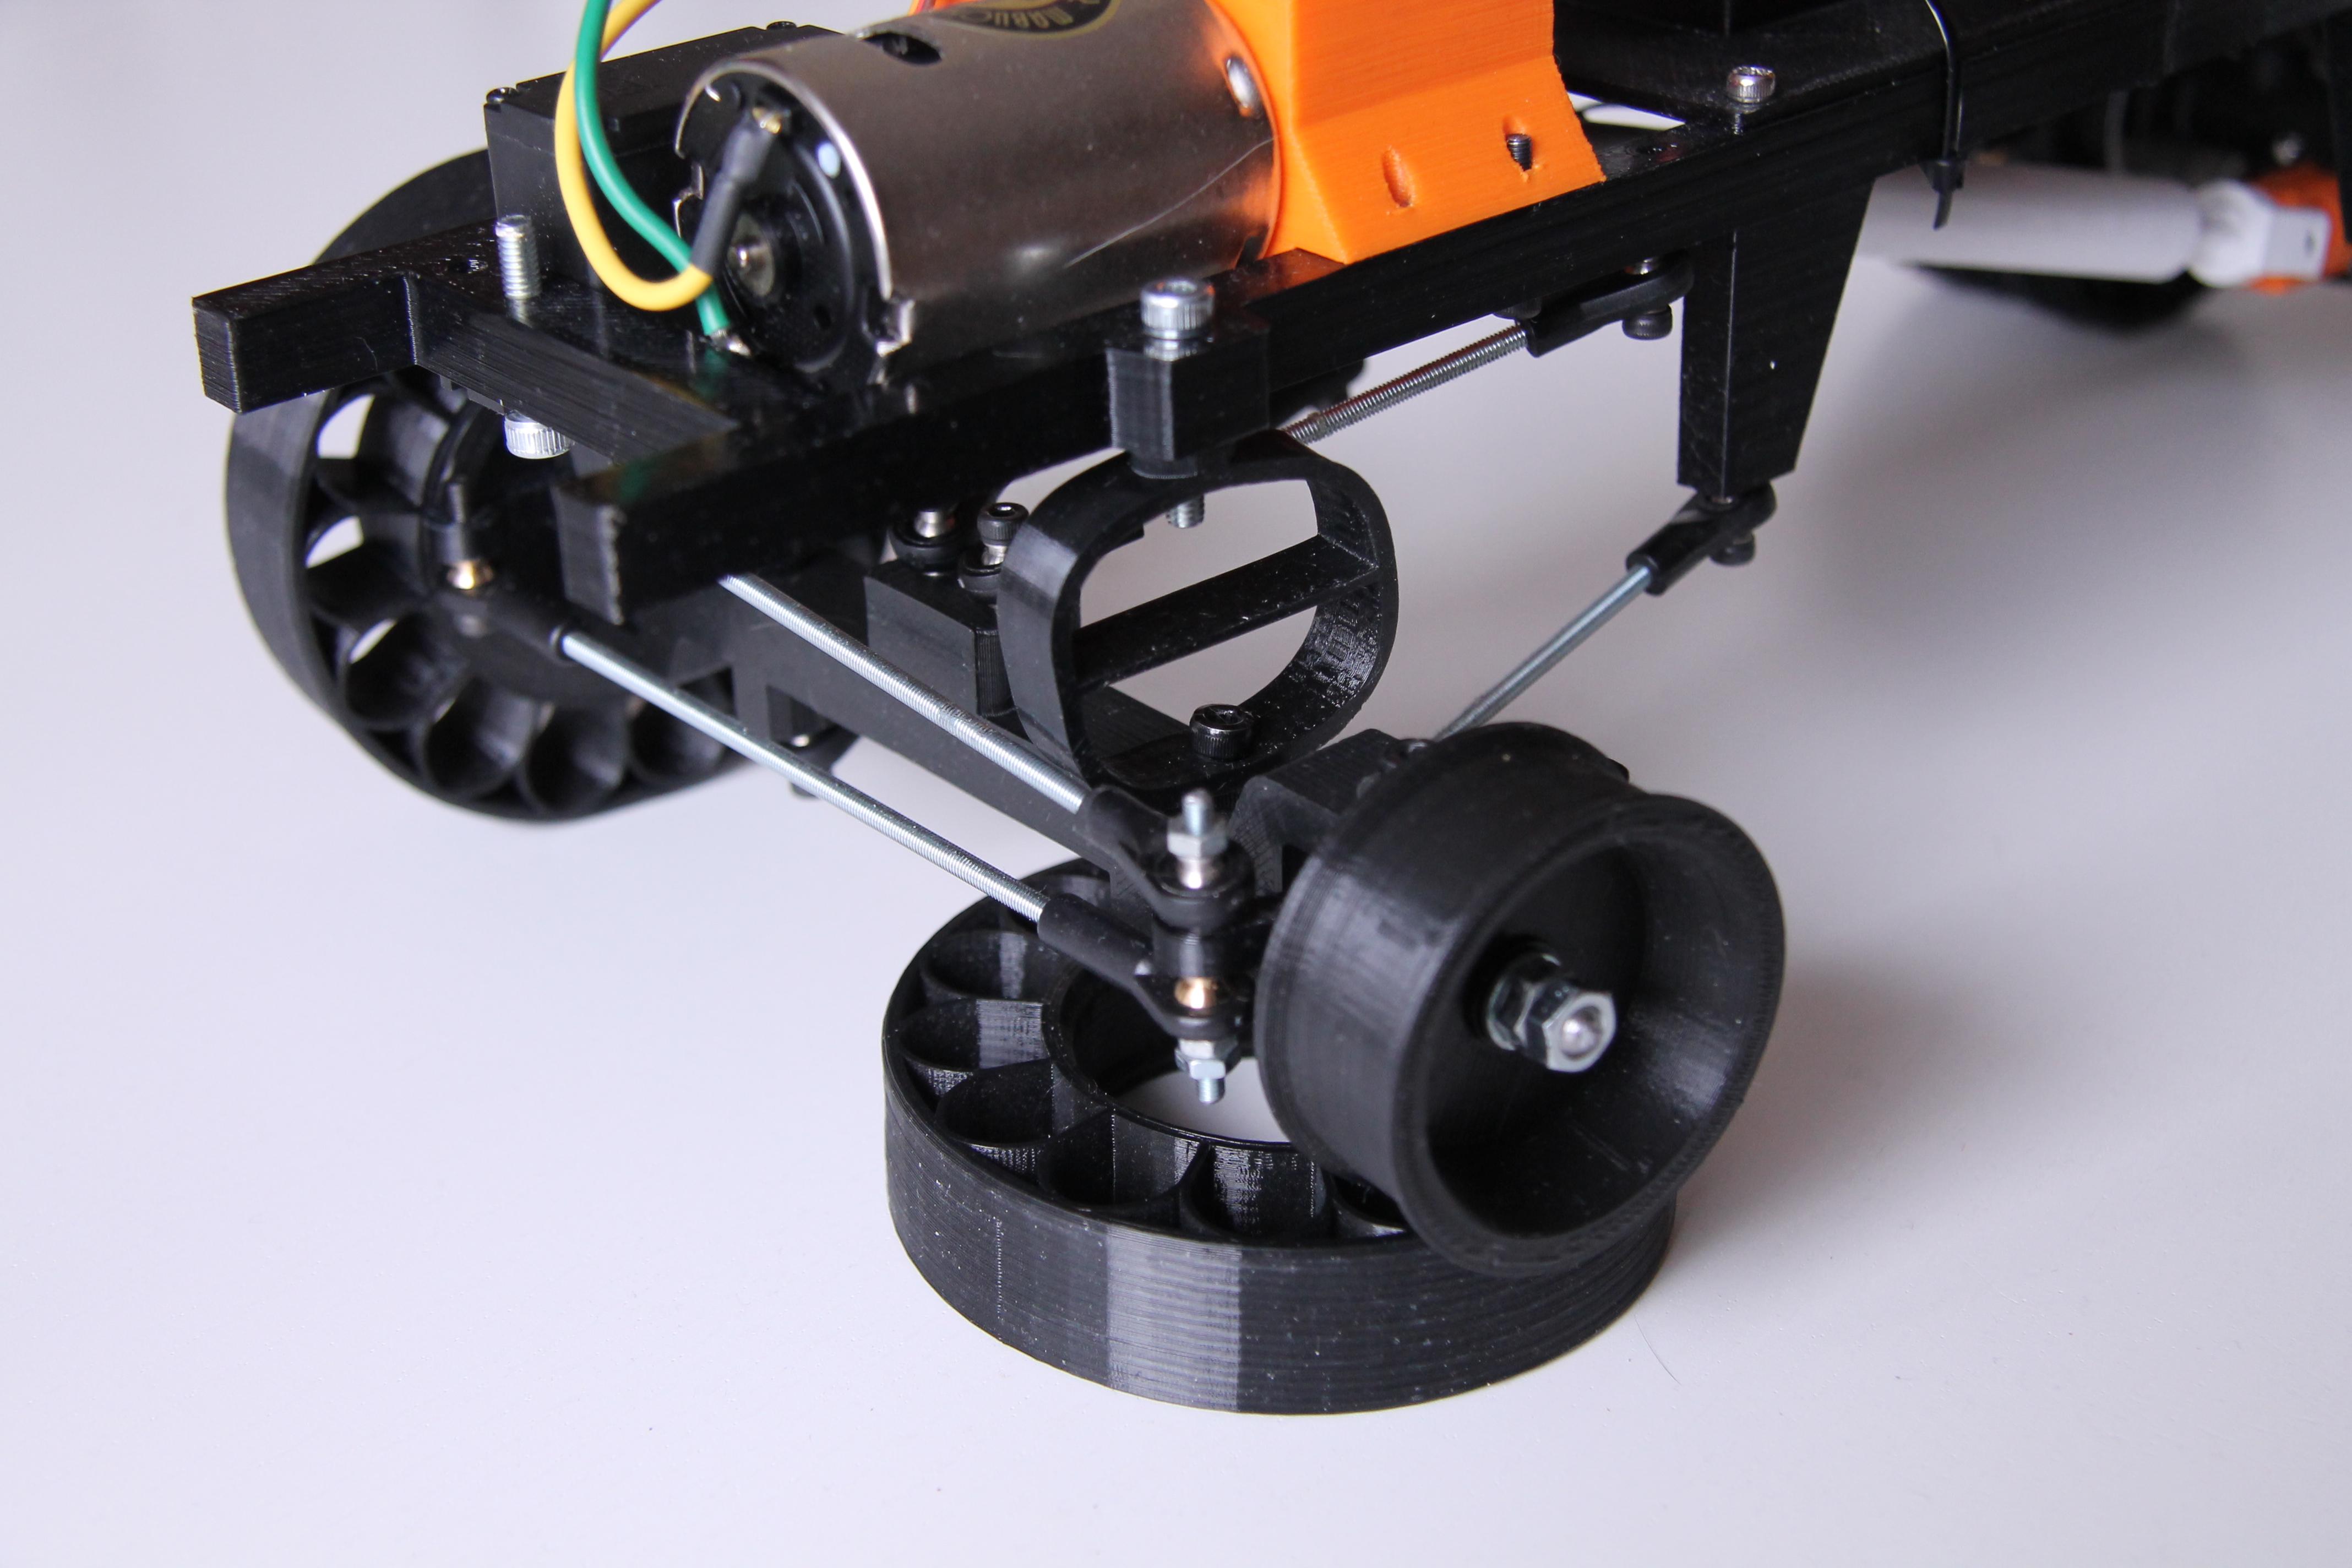 033.JPG Download free STL file Printed truck V1: Springs • 3D print template, MrCrankyface